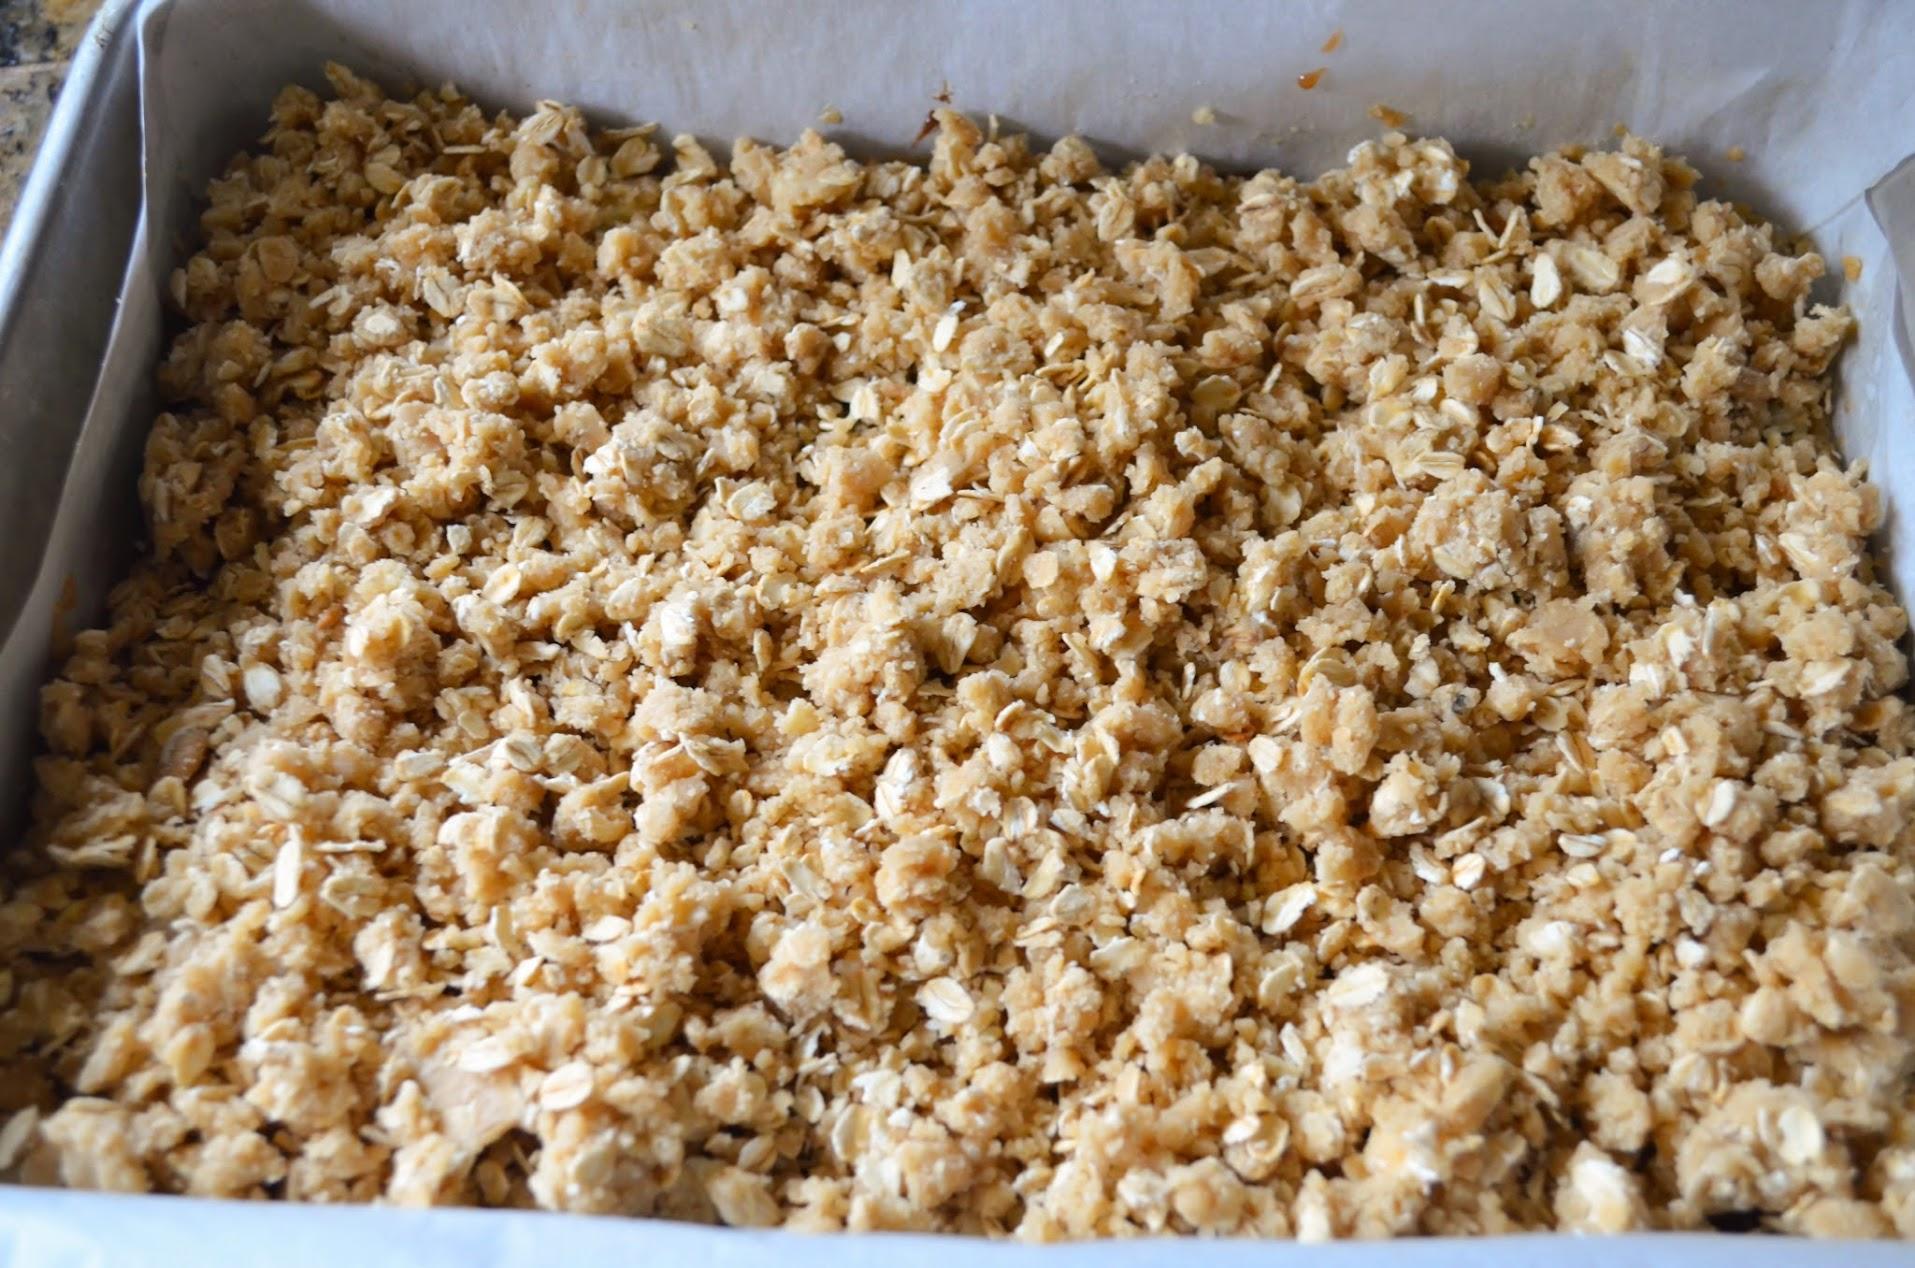 Oatmeal-Chocolate-Caramel-Carmelitas-Sprinkle-Oatmeal-Crust.jpg